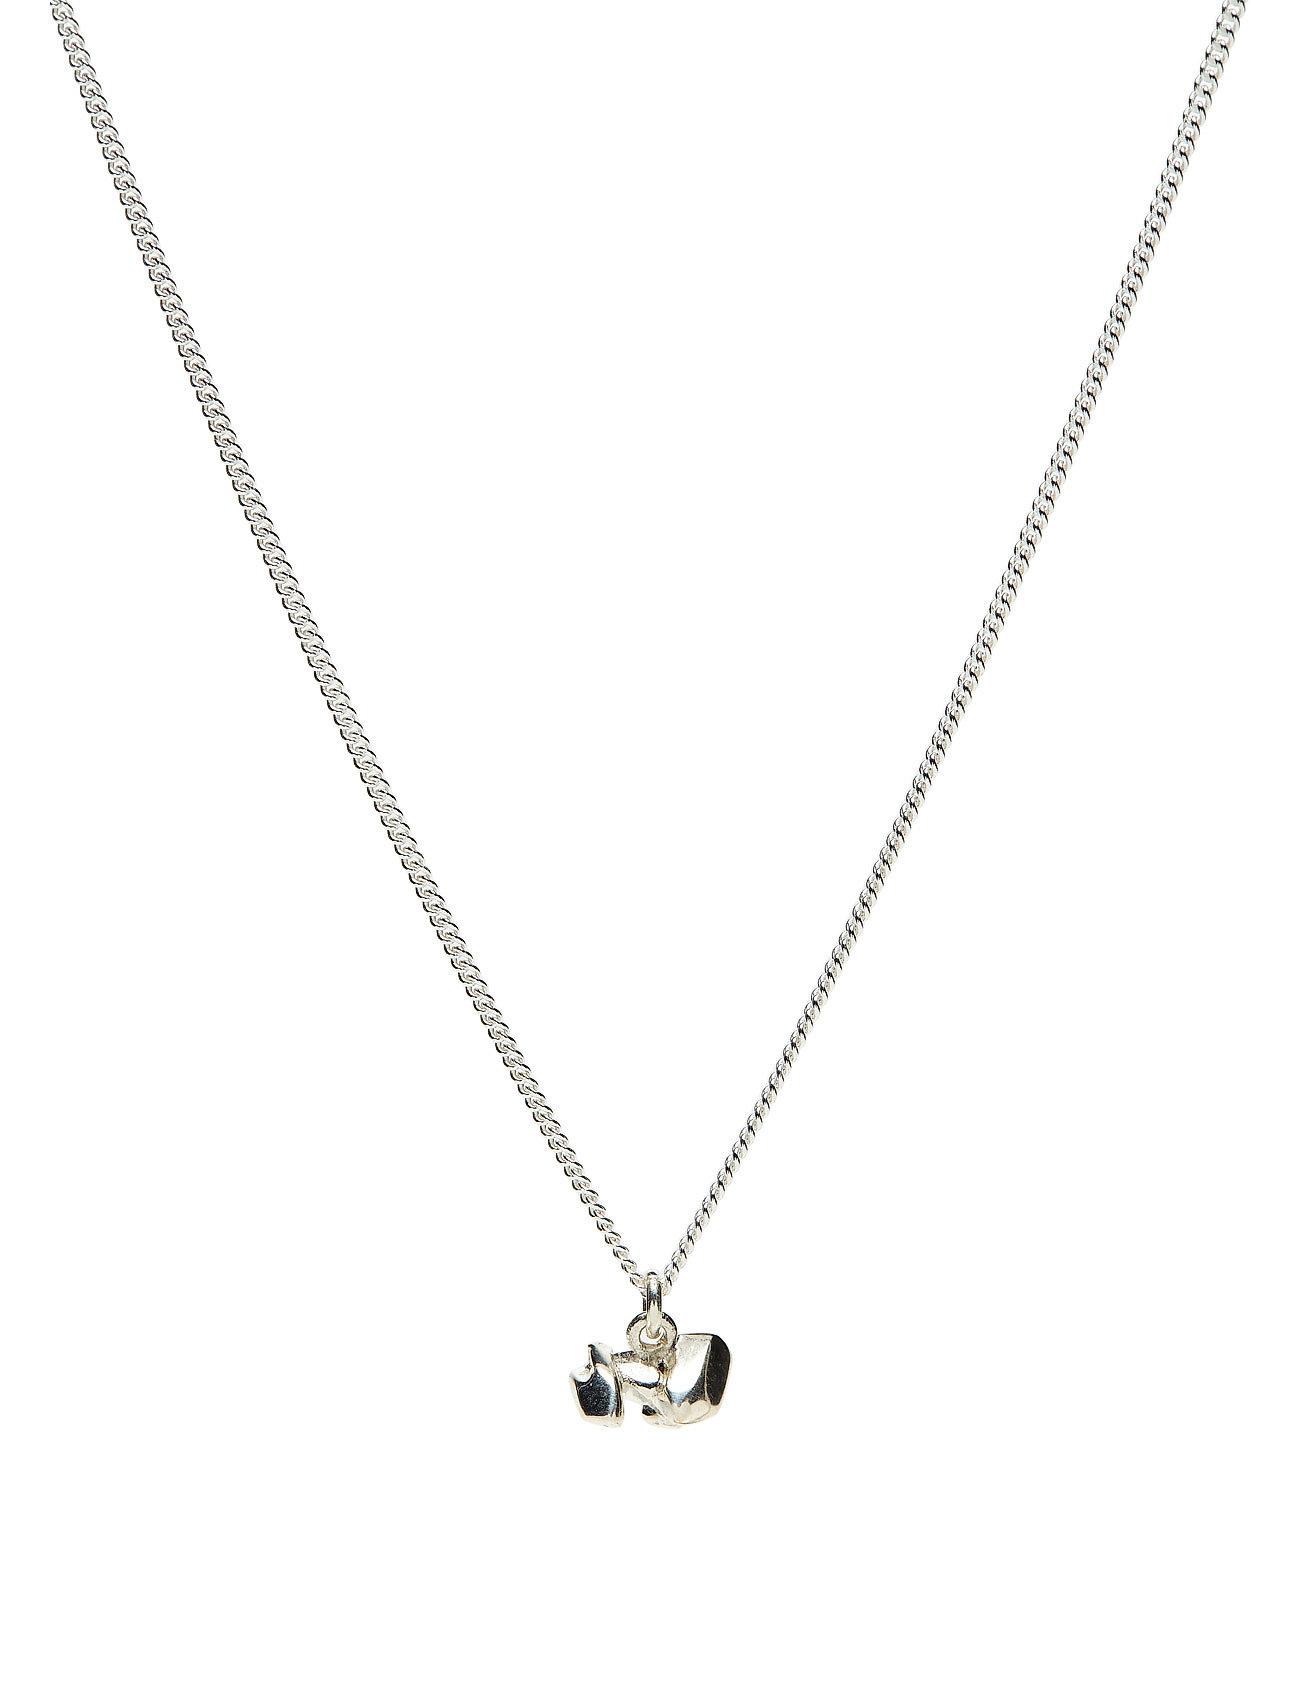 Charmed Necklace Xs Cornelia Webb Smykker til Damer i